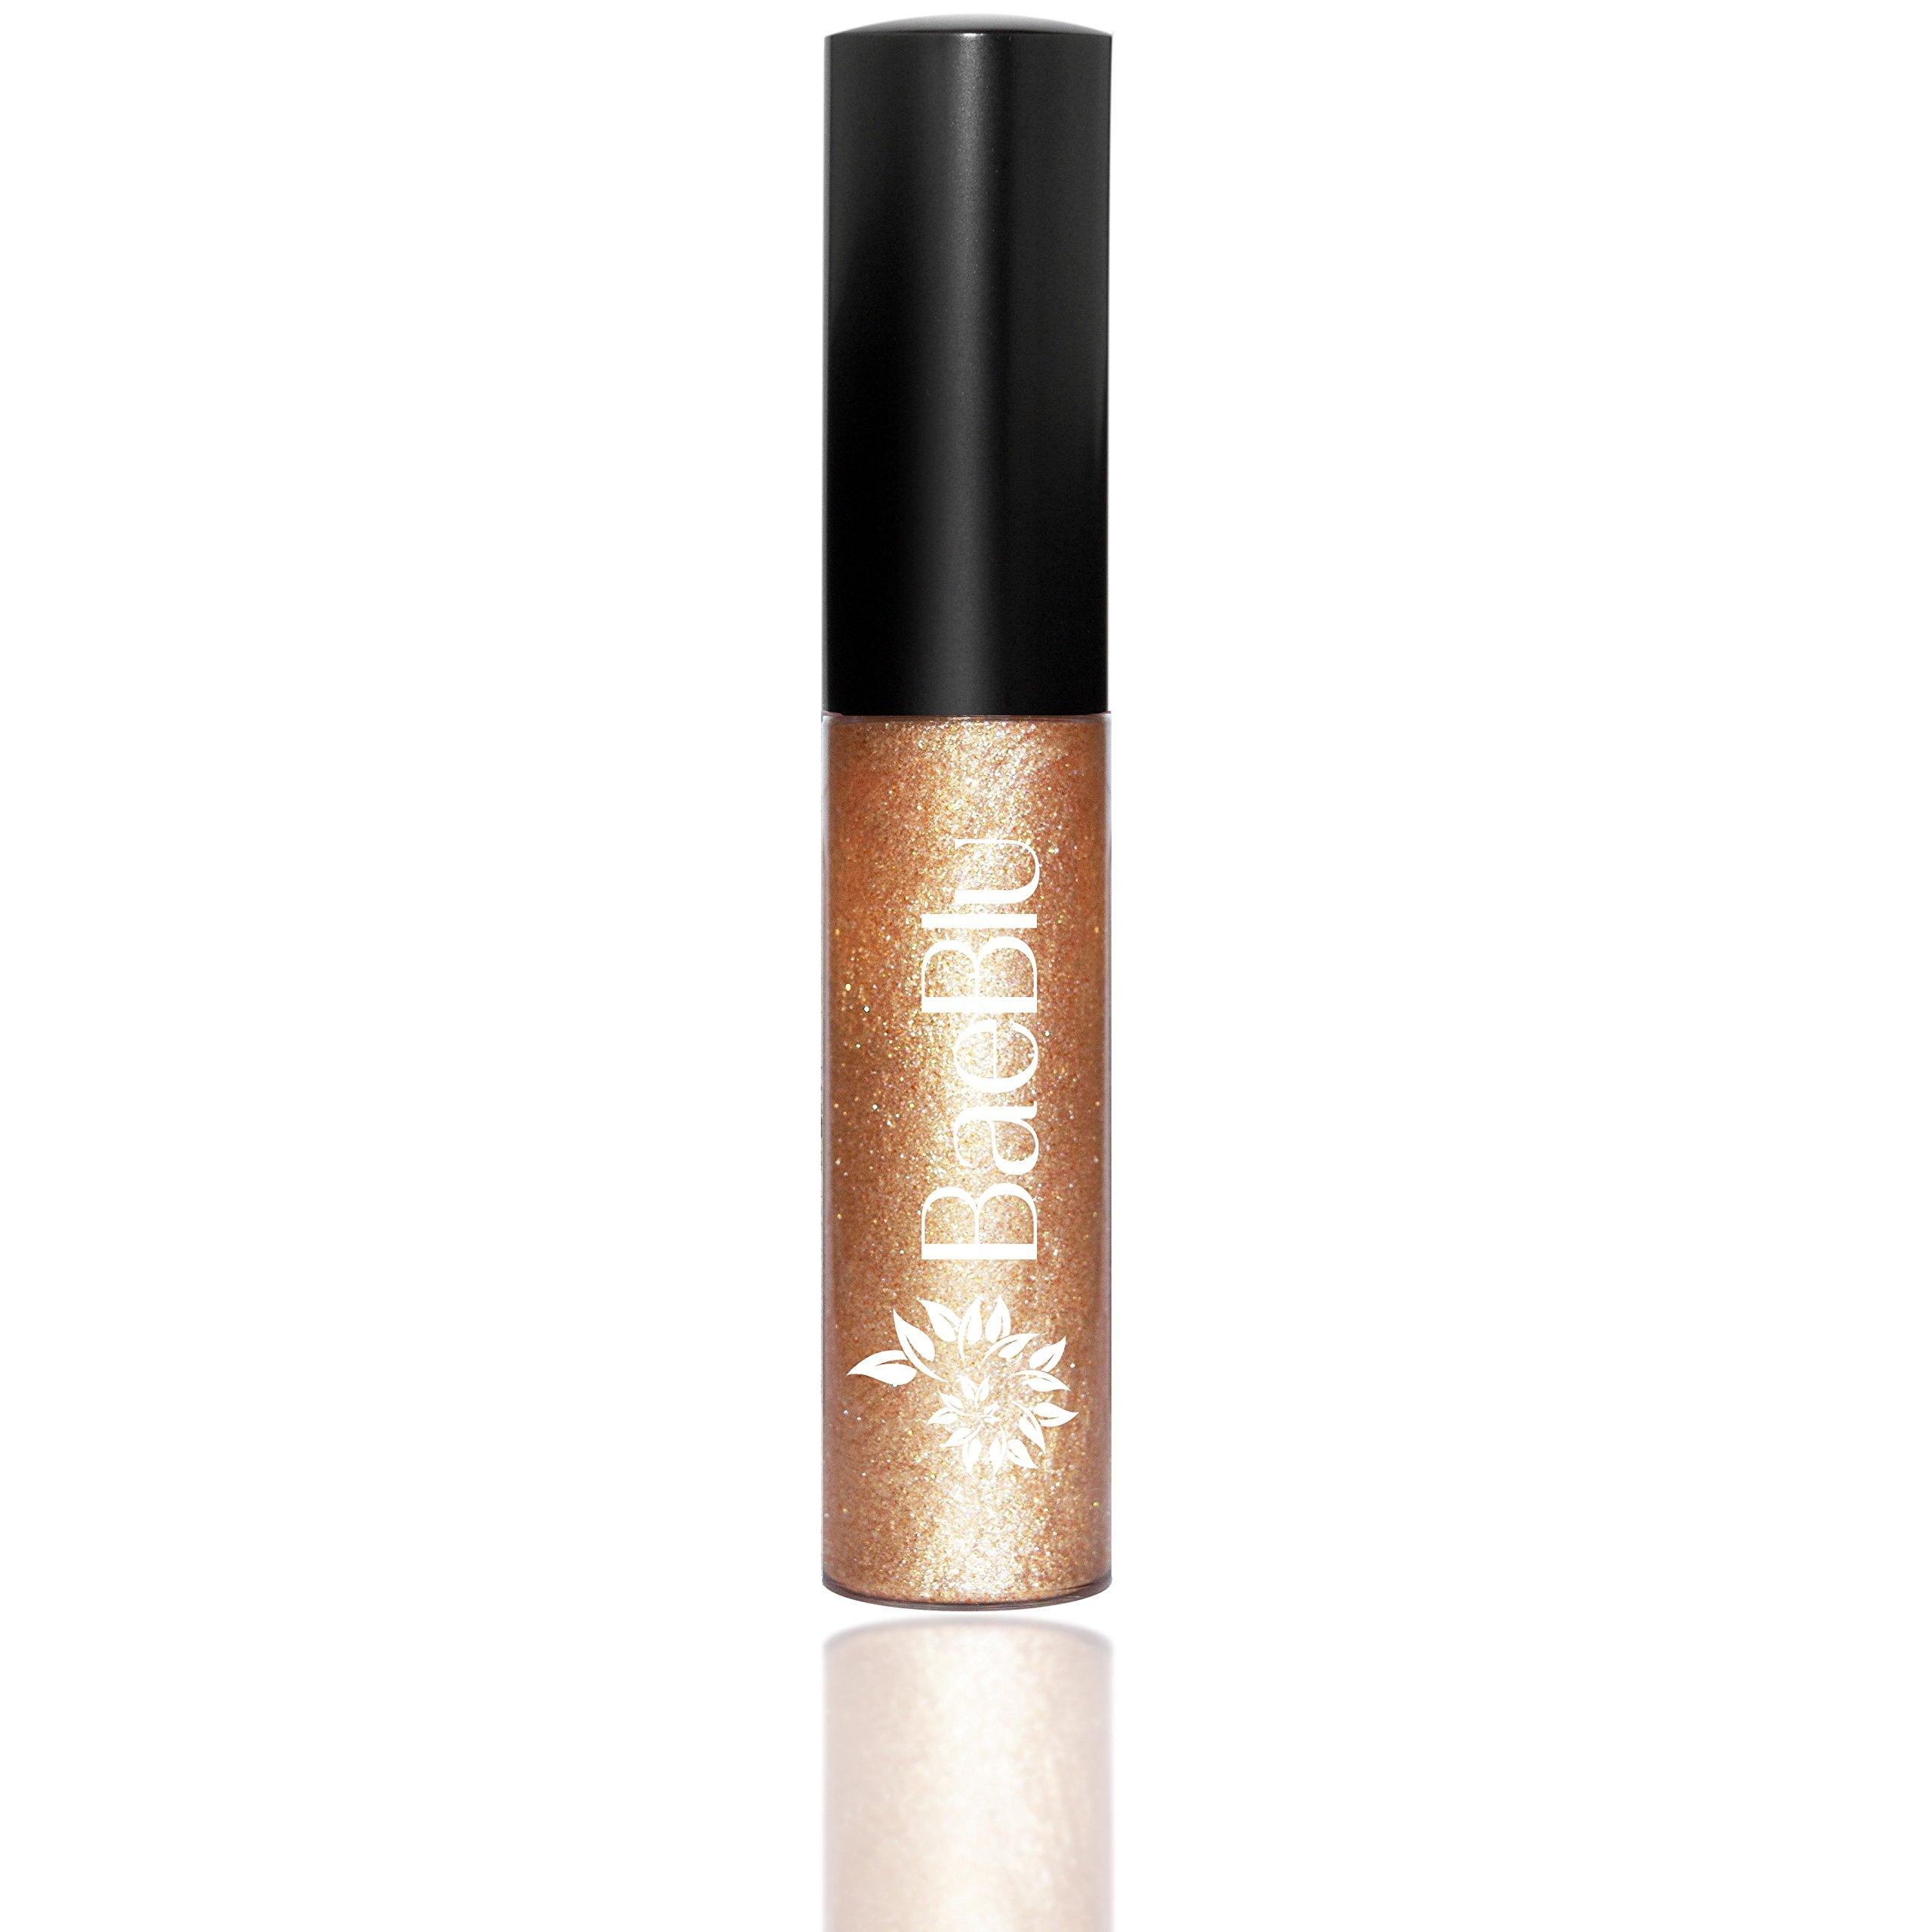 BaeBlu Organic Vegan Lip Gloss, 100% Natural Non-Toxic Moisturizing Ingredients, Bedazzled